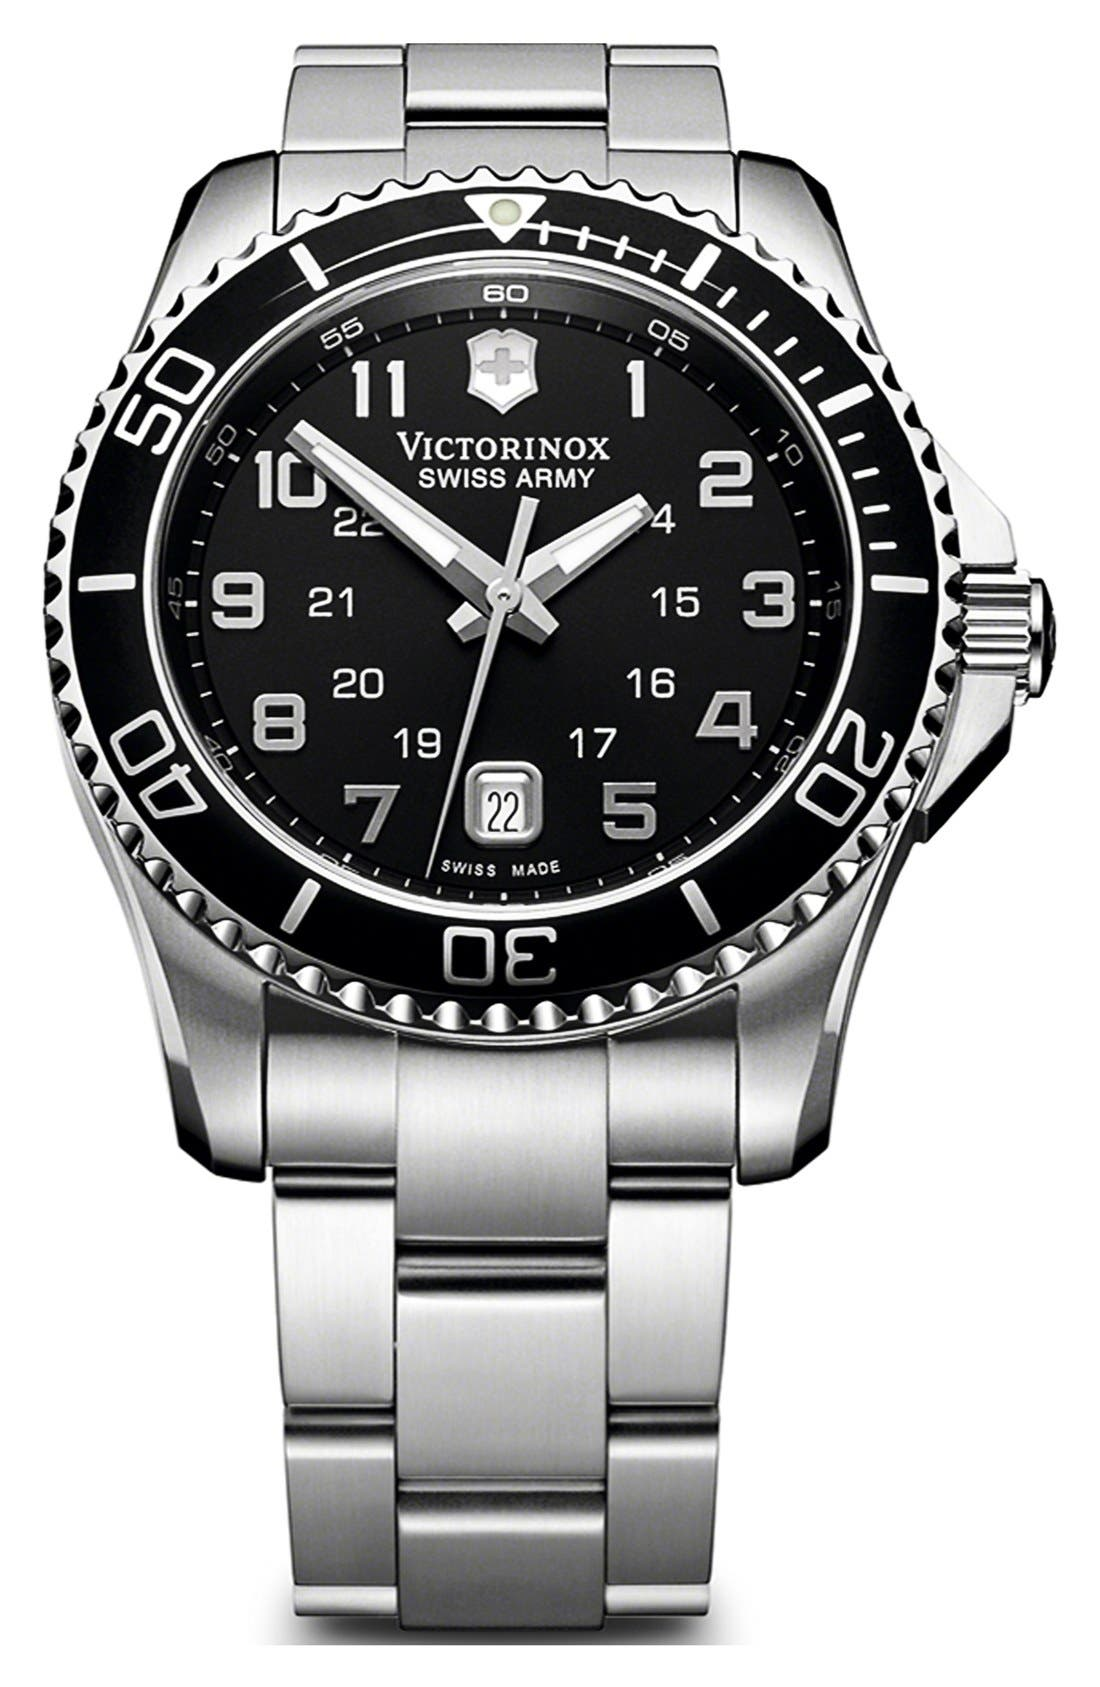 Main Image - Victorinox Swiss Army® 'Maverick GS' Stainless Steel Watch, 43mm